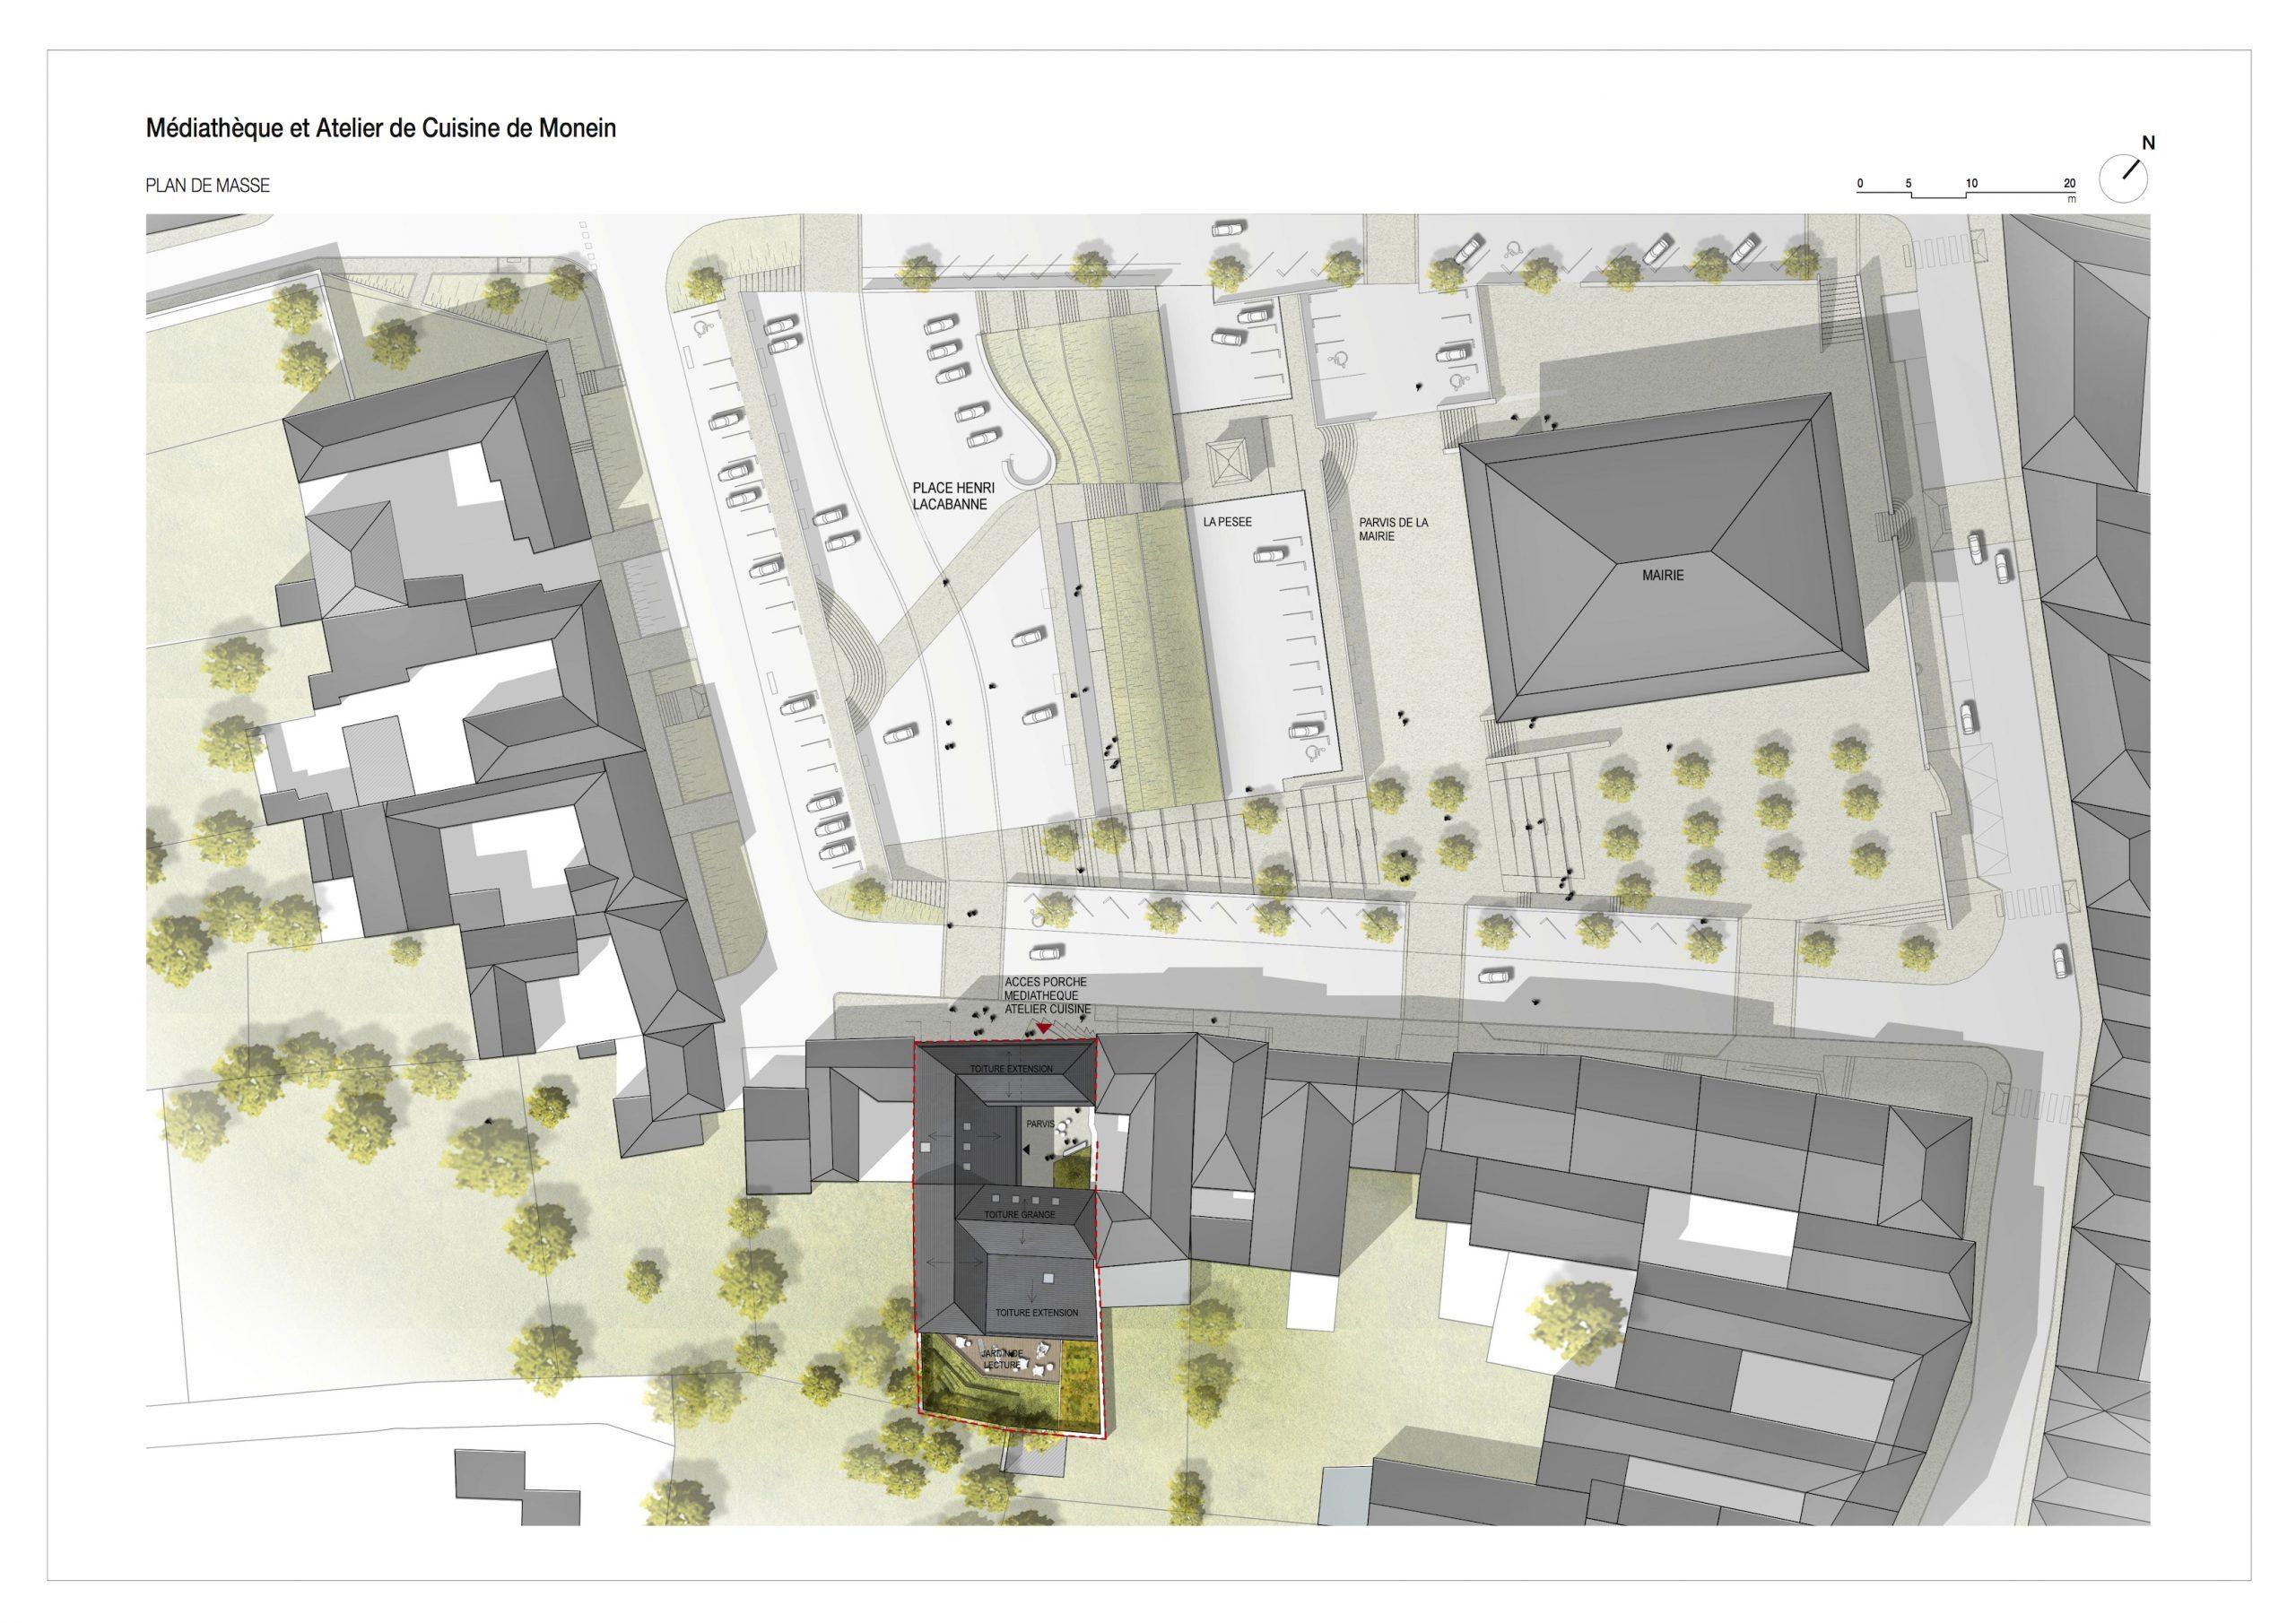 Memo _ Médiathèque Et Atelier De Cuisine De Monein | Prad ... destiné Gertrud+Franck+Plan+Jardin